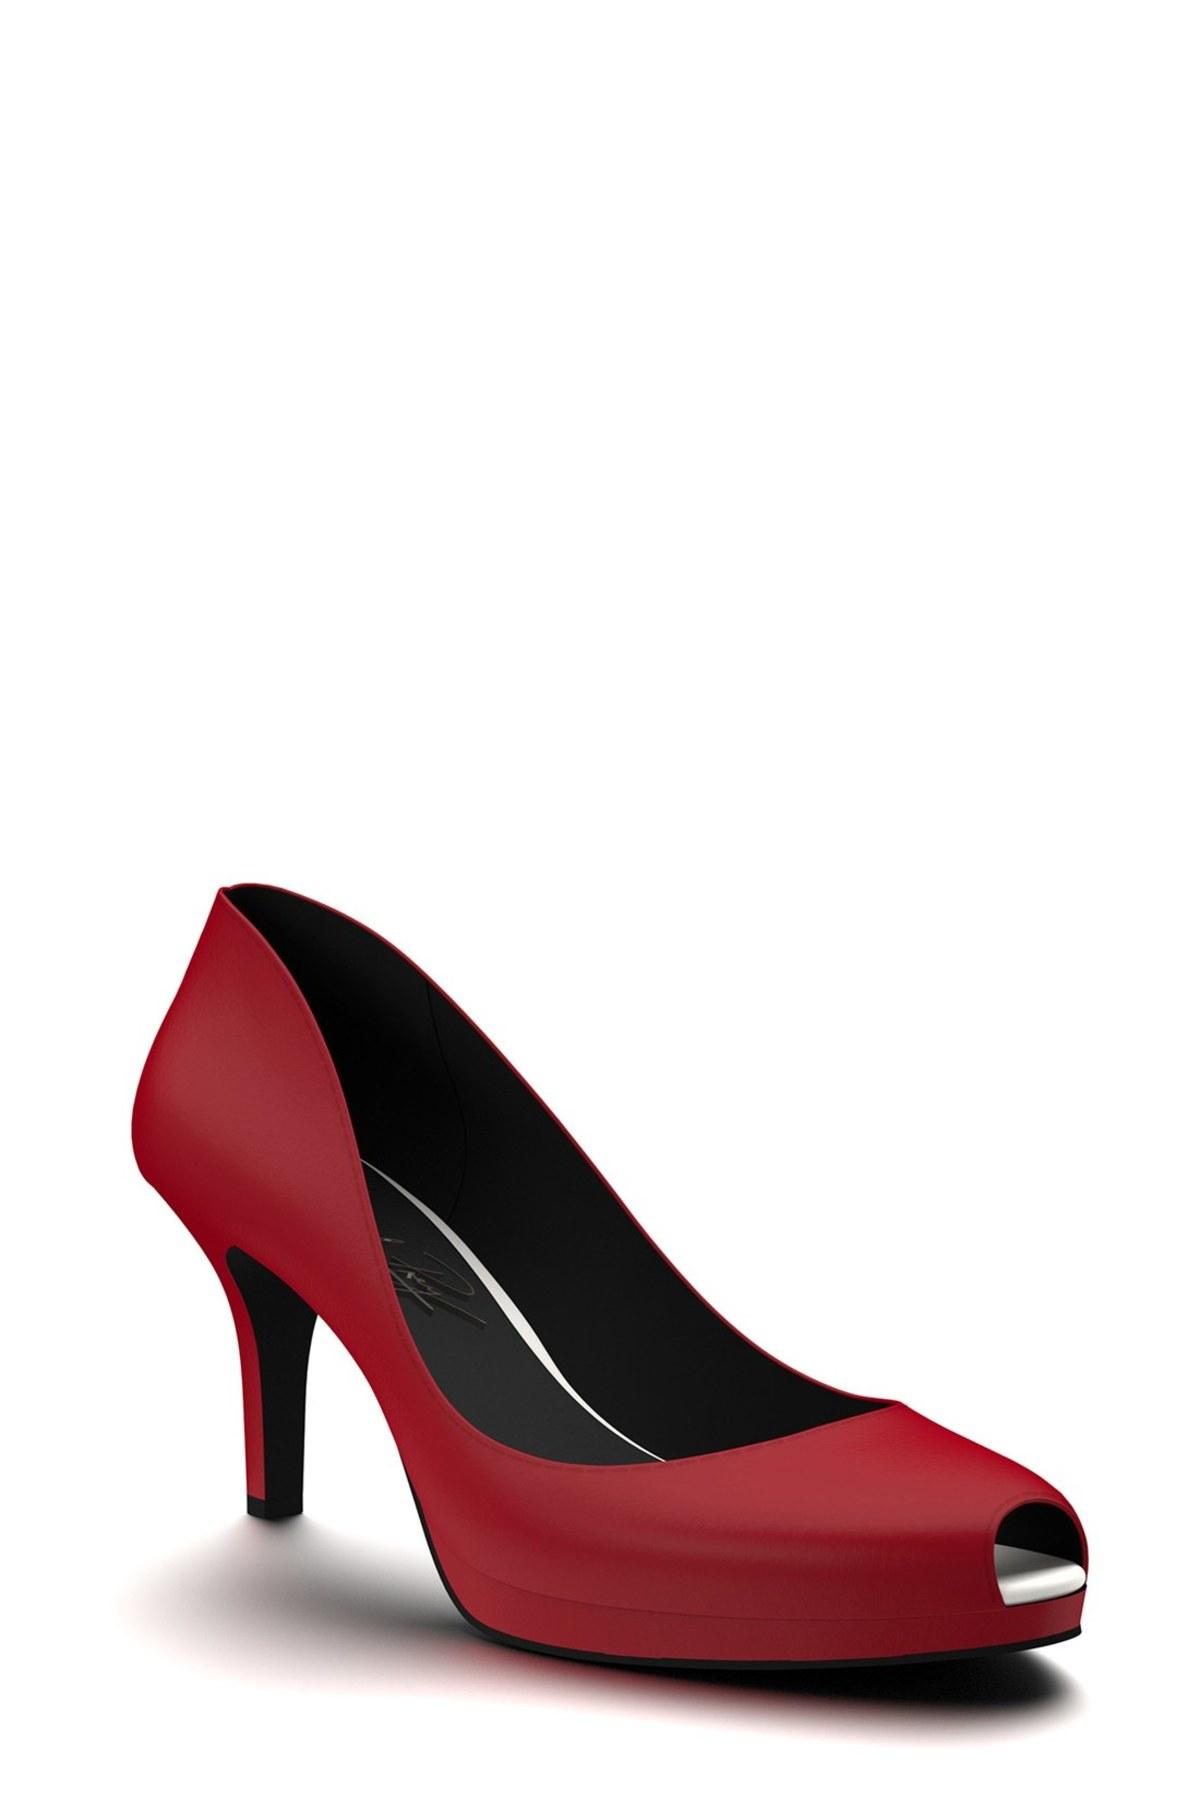 Shoes Of Prey Peep Toe